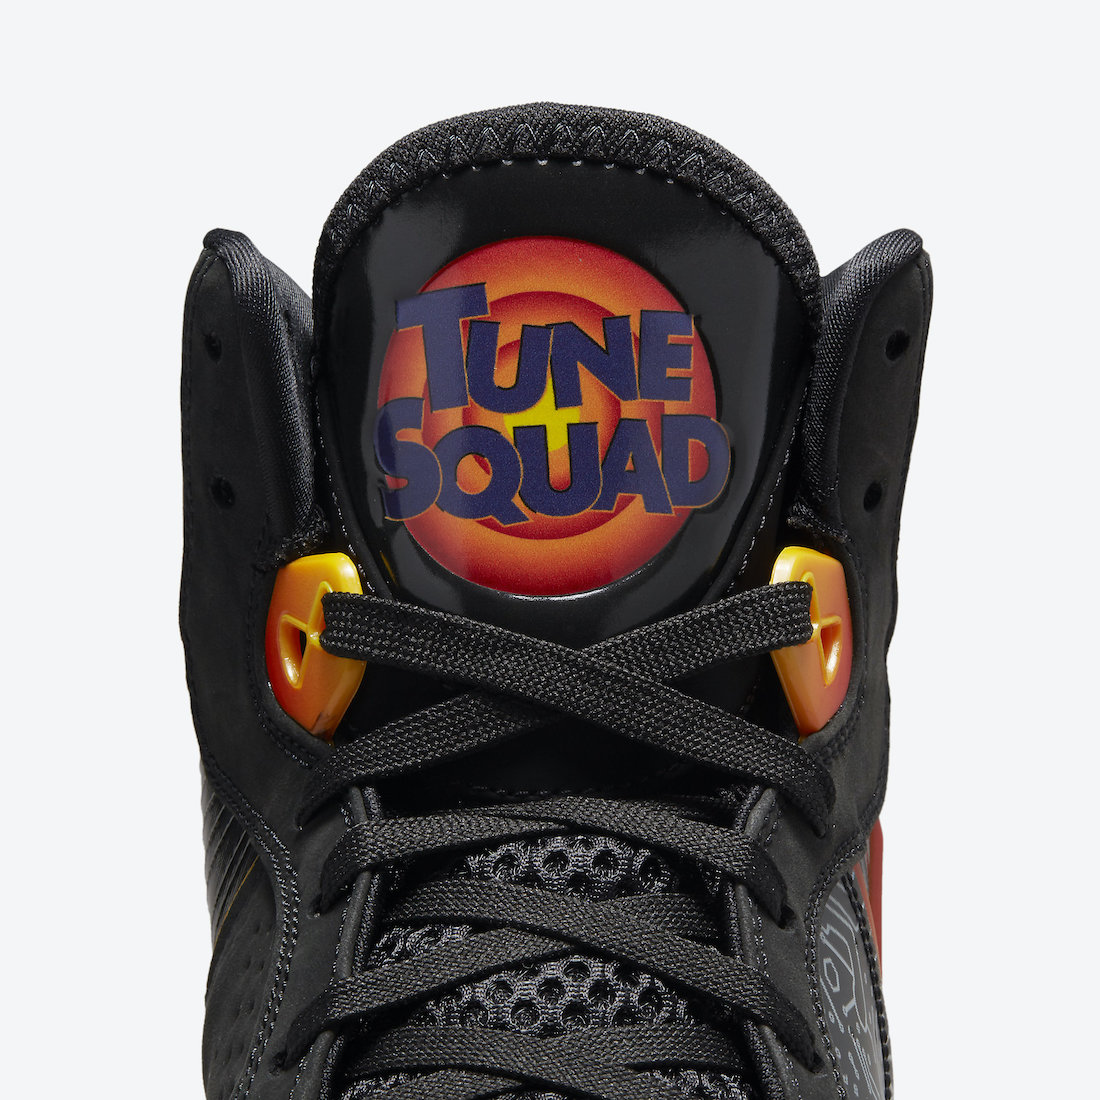 Nike-LeBron-8-Space-Jam-DB1732-001-Release-Date-9-1